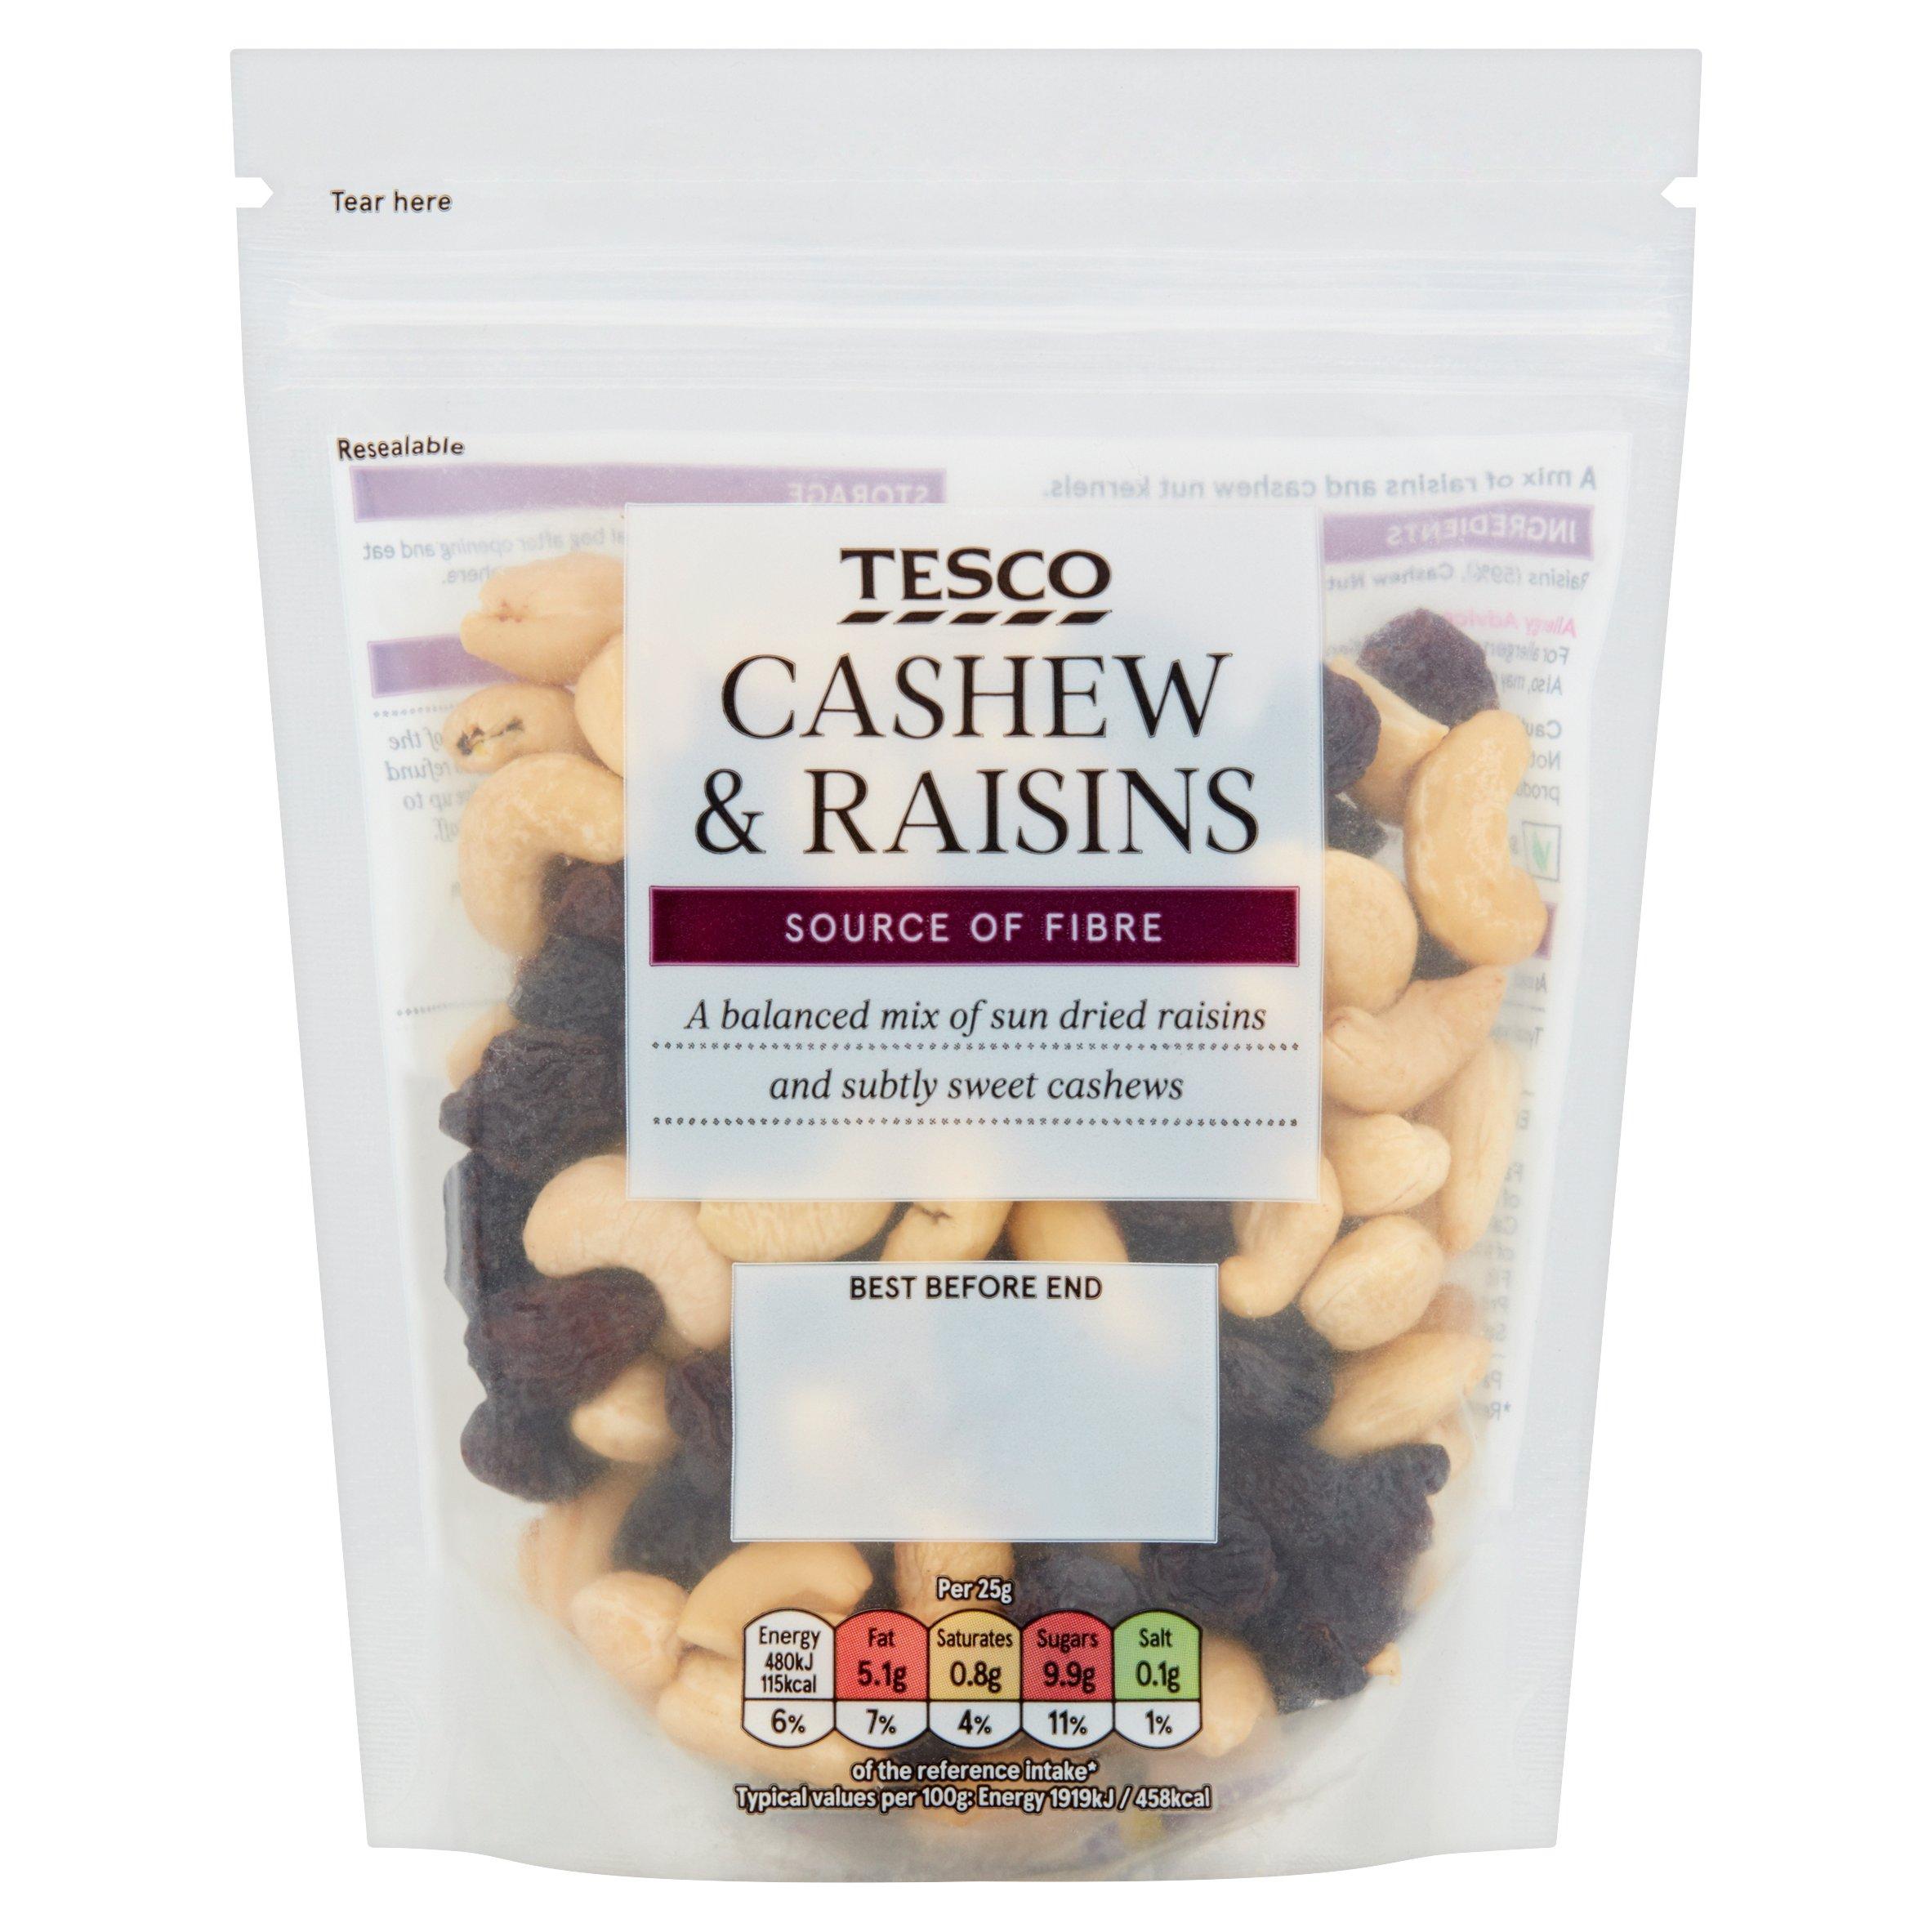 Tesco Cashew & Raisins 200G